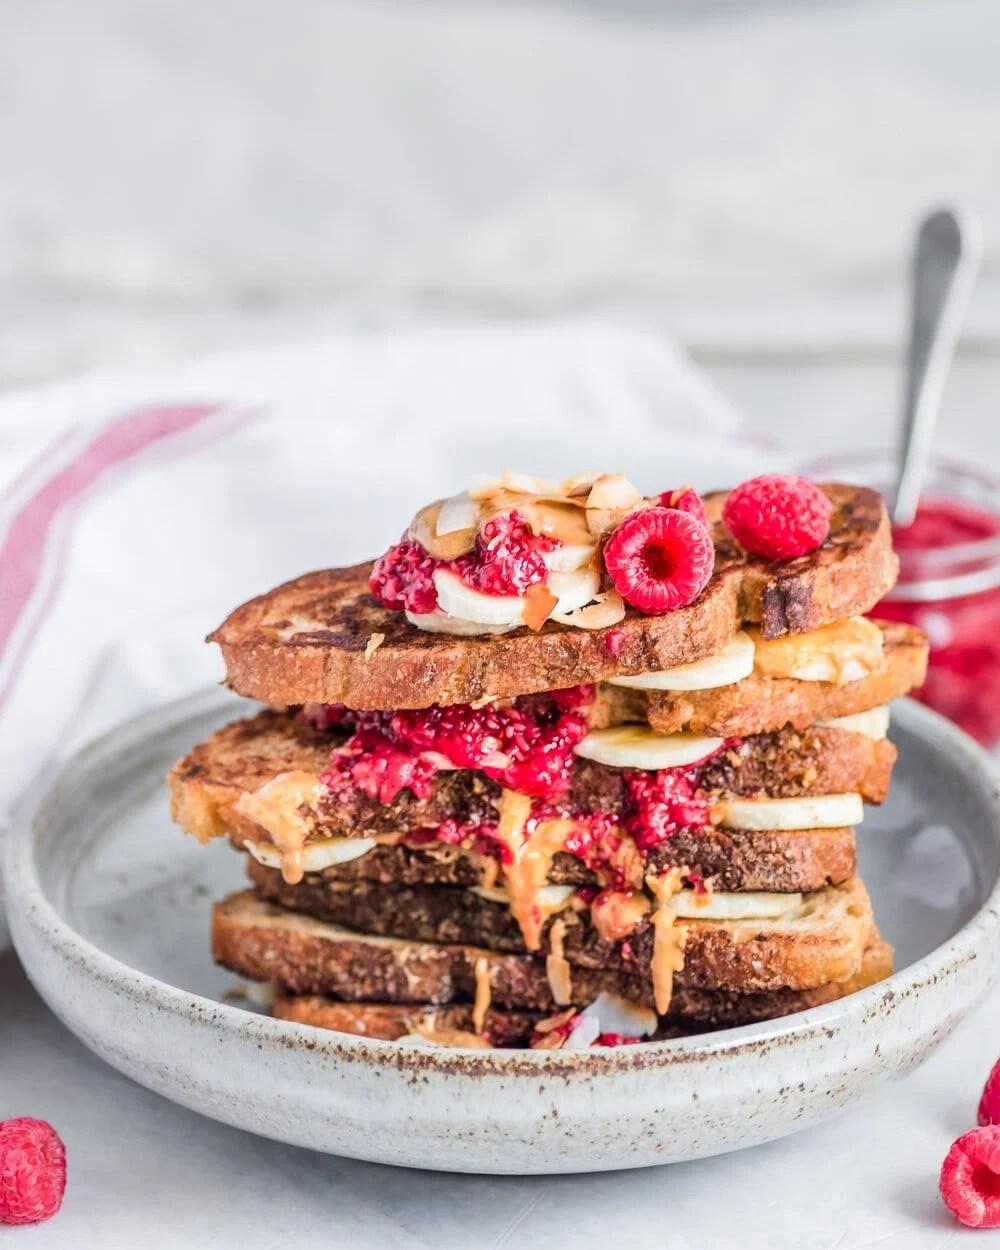 Peanut Butter, Banana, and Jam Sandwiches